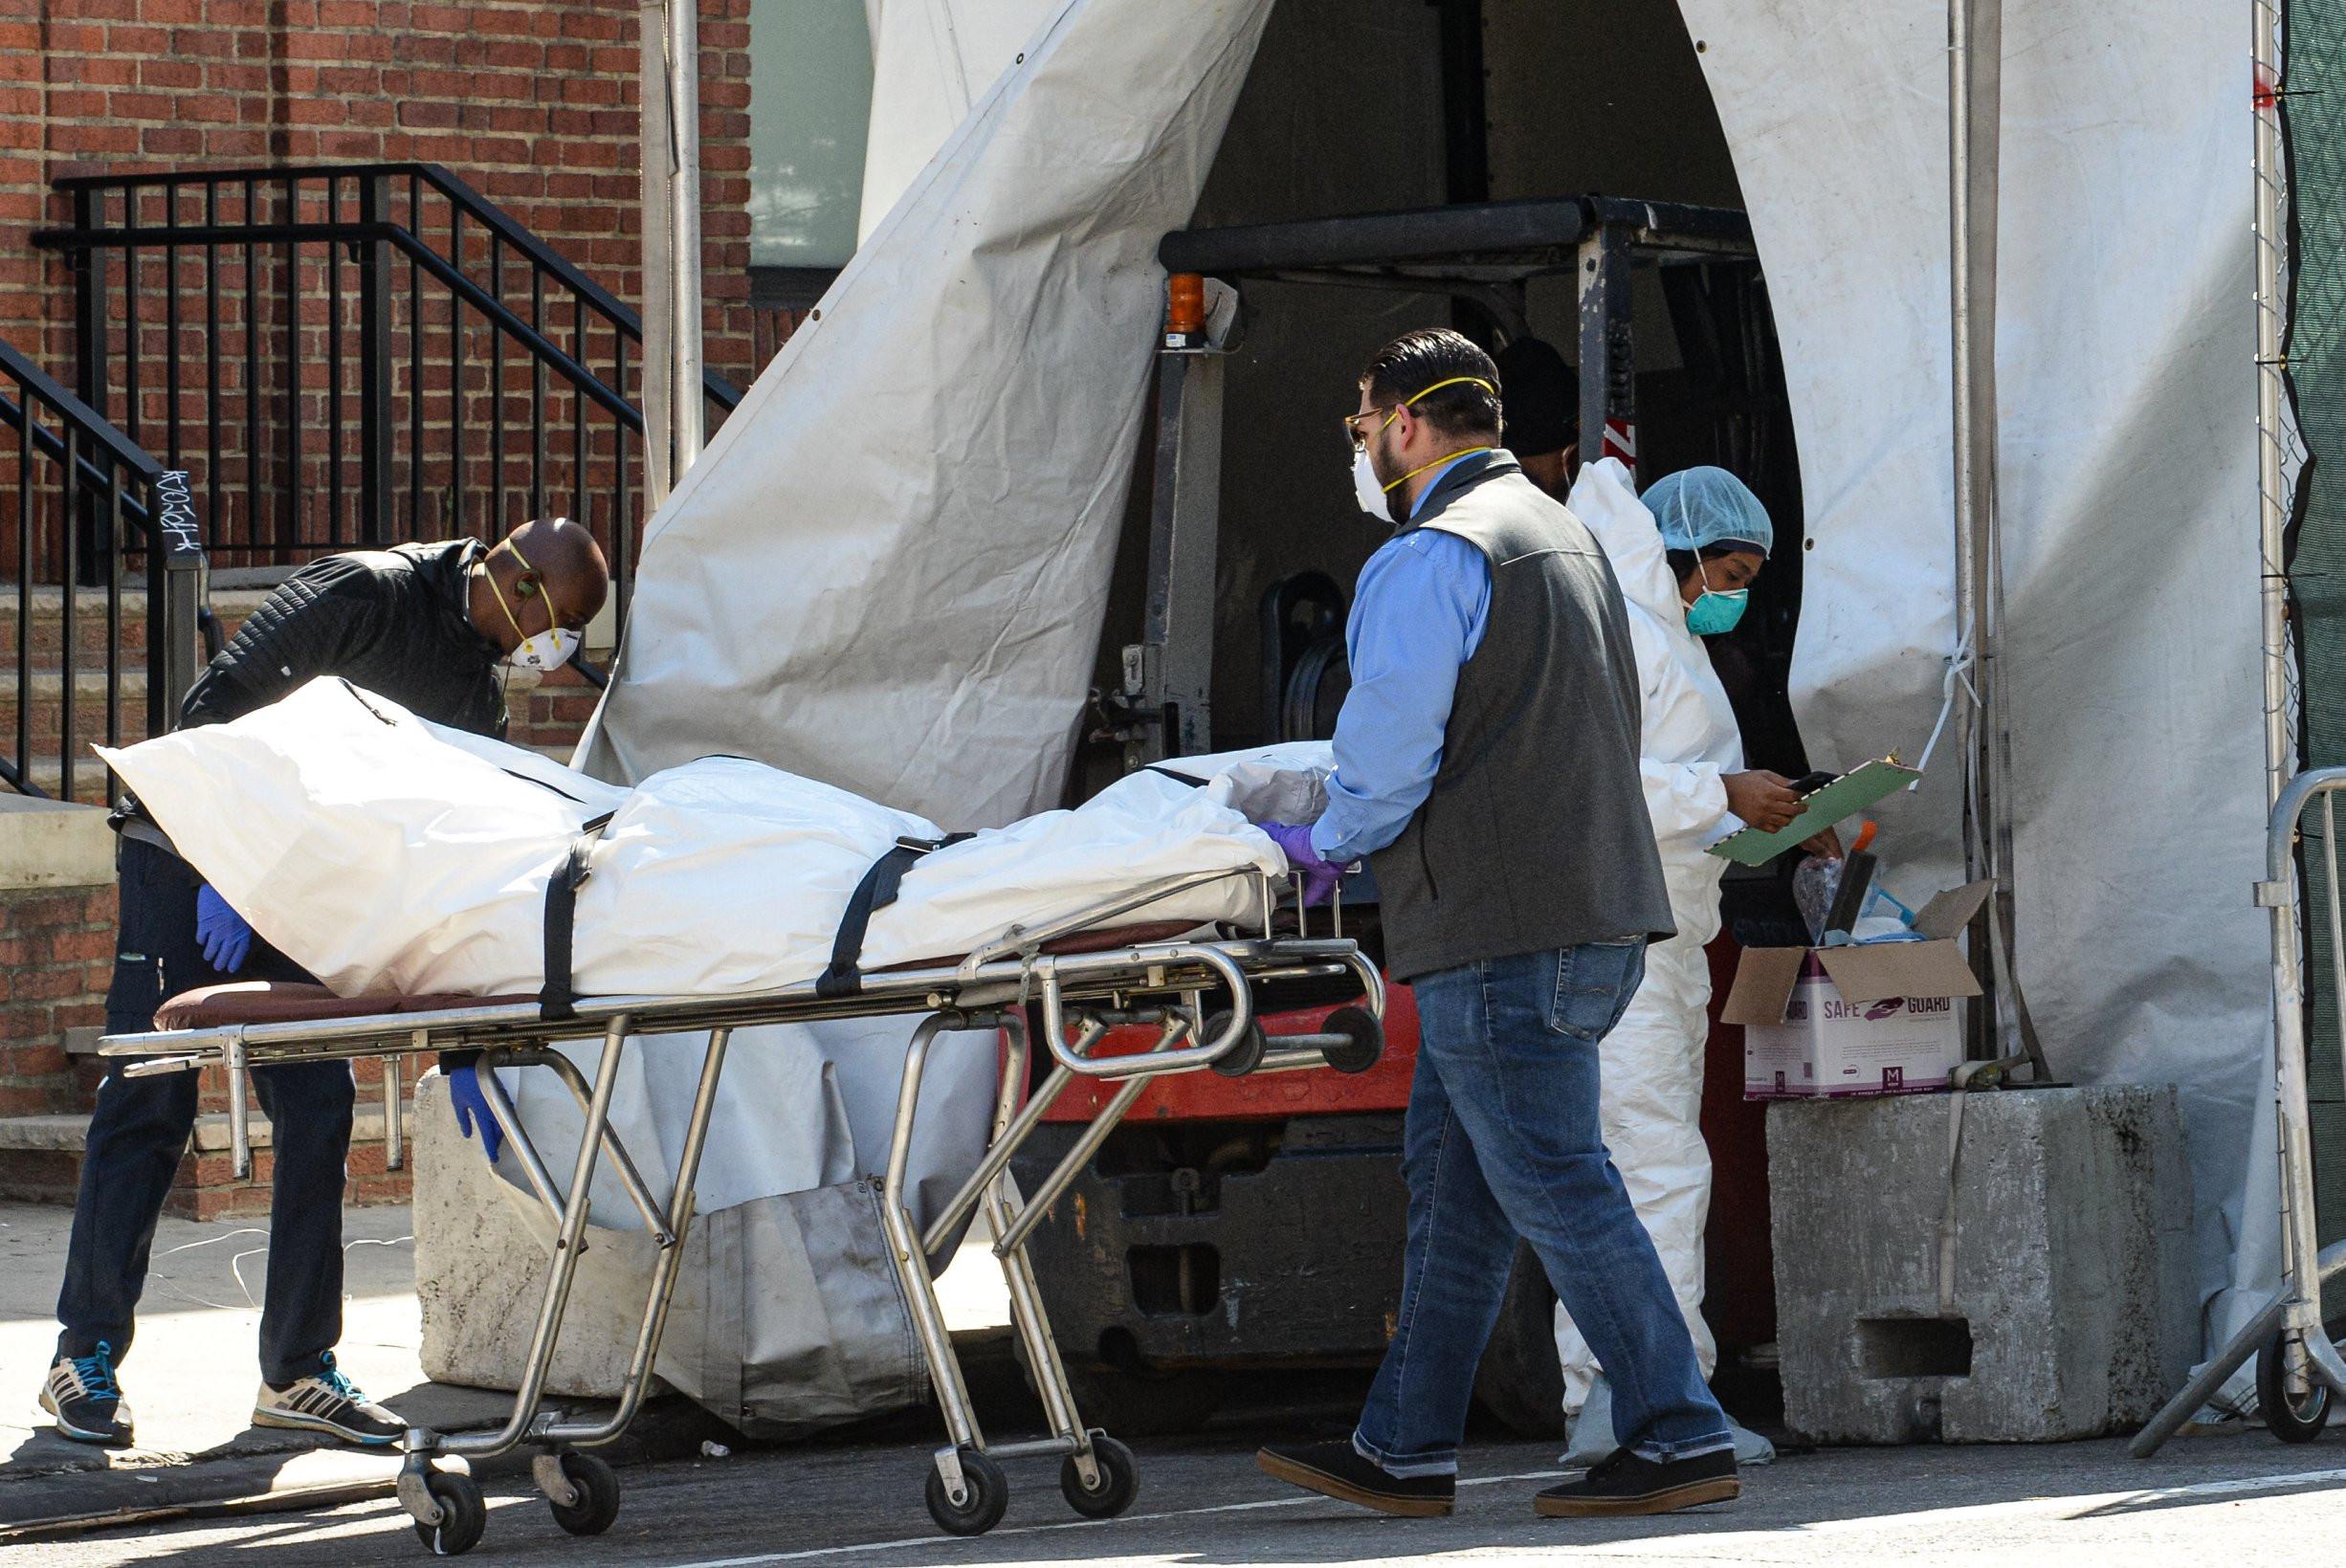 Medicinski radnici odvoze telo preminulog od virusa COVID-19 ispred Bruklin bolnice, Njujork, 06. april 2020. (Foto: Marcus Santos/ZUMA Wire)